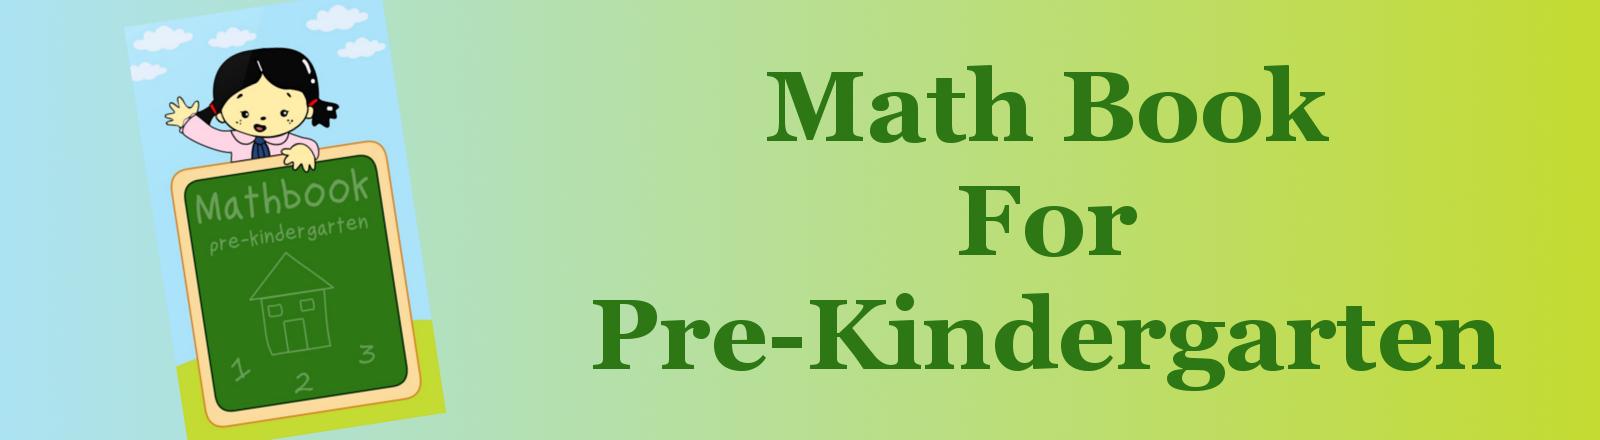 Math Book For Pre-Kindergarten